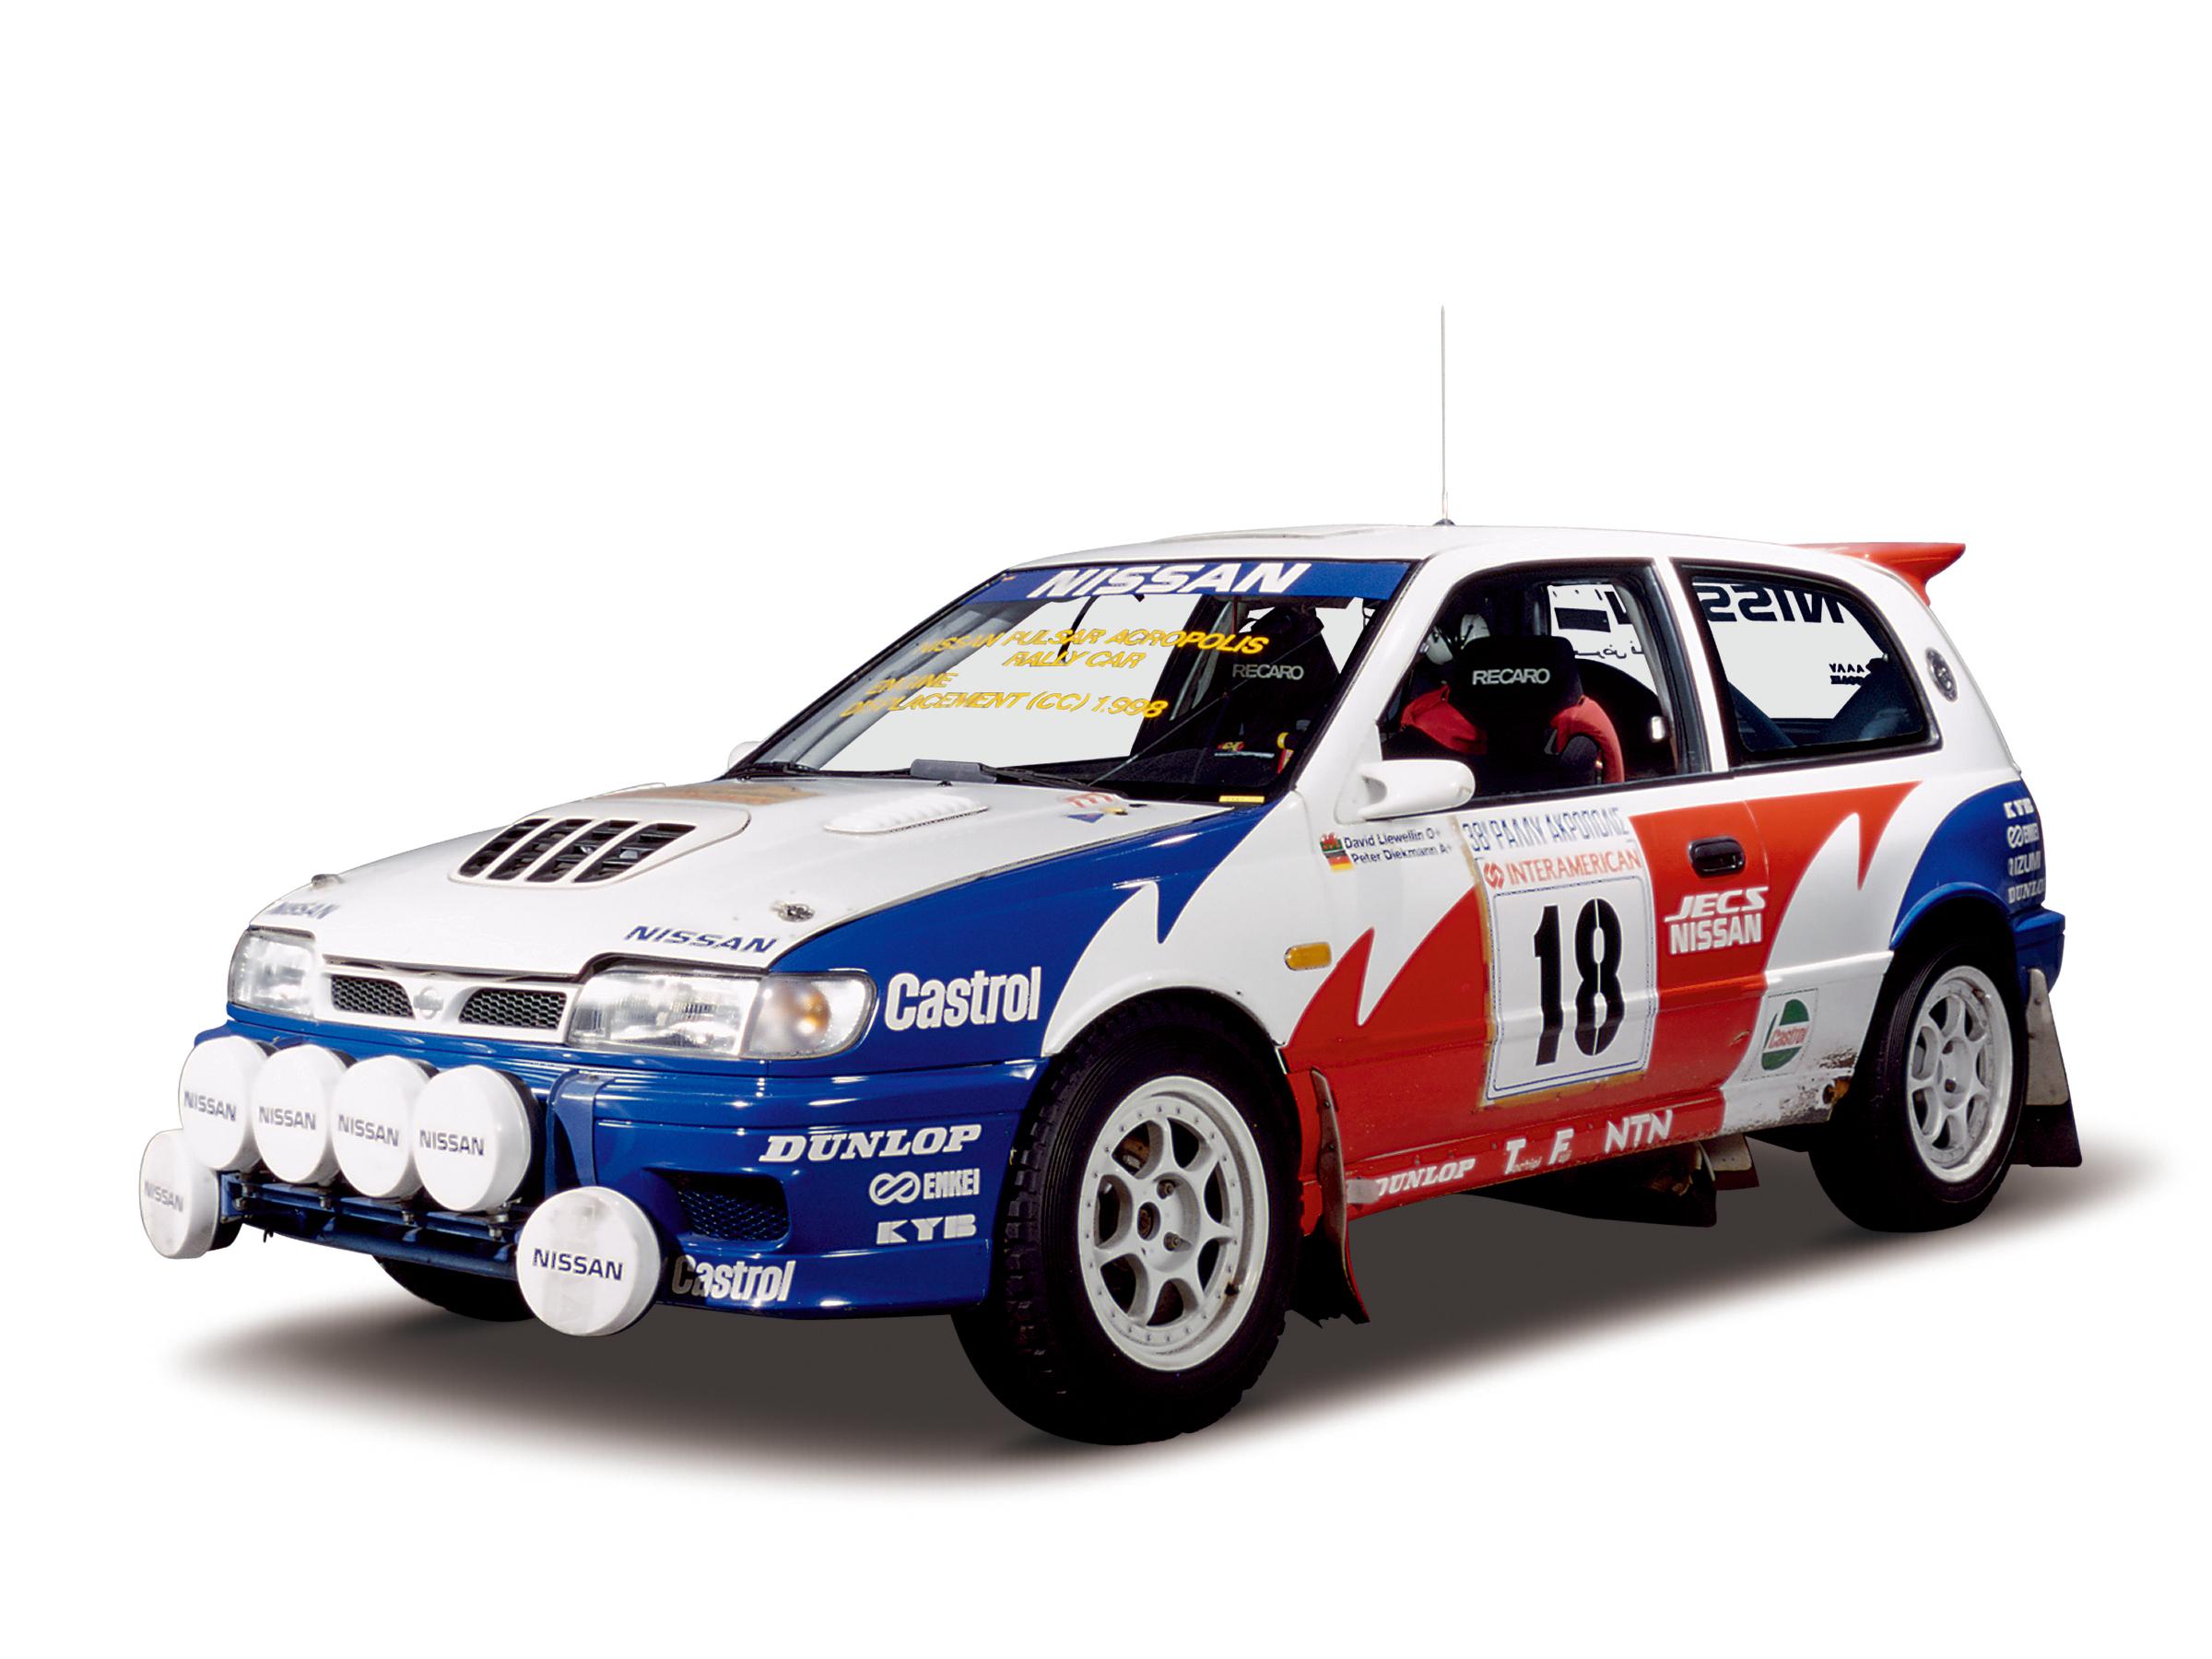 Datsun Race Car For Sale